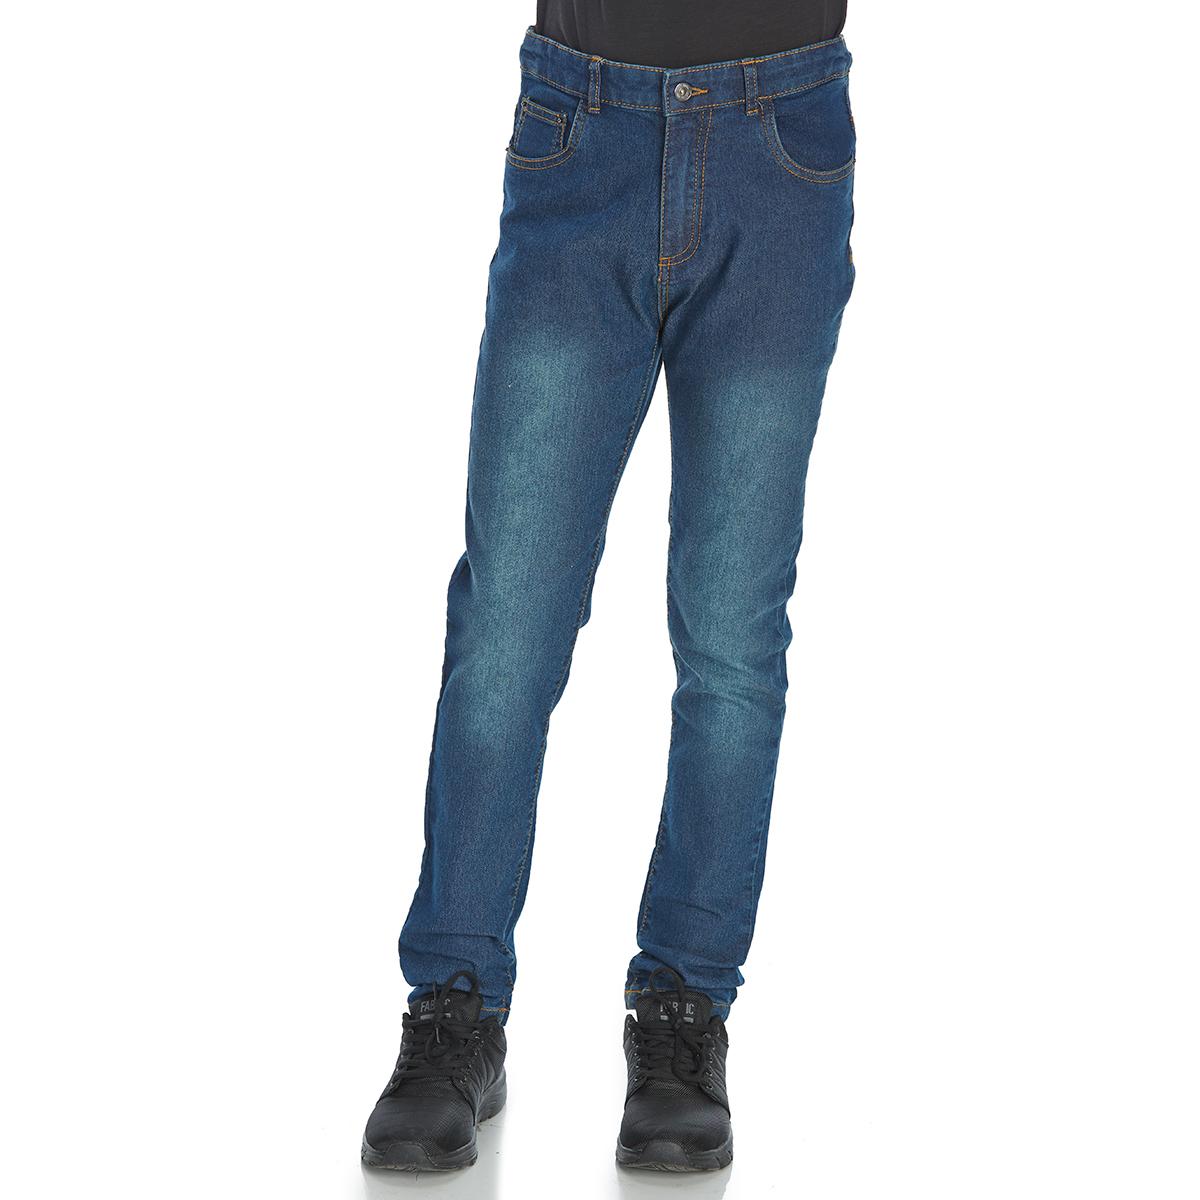 Minoti Big Boys' Skinny Denim Jeans - Blue, 8-9